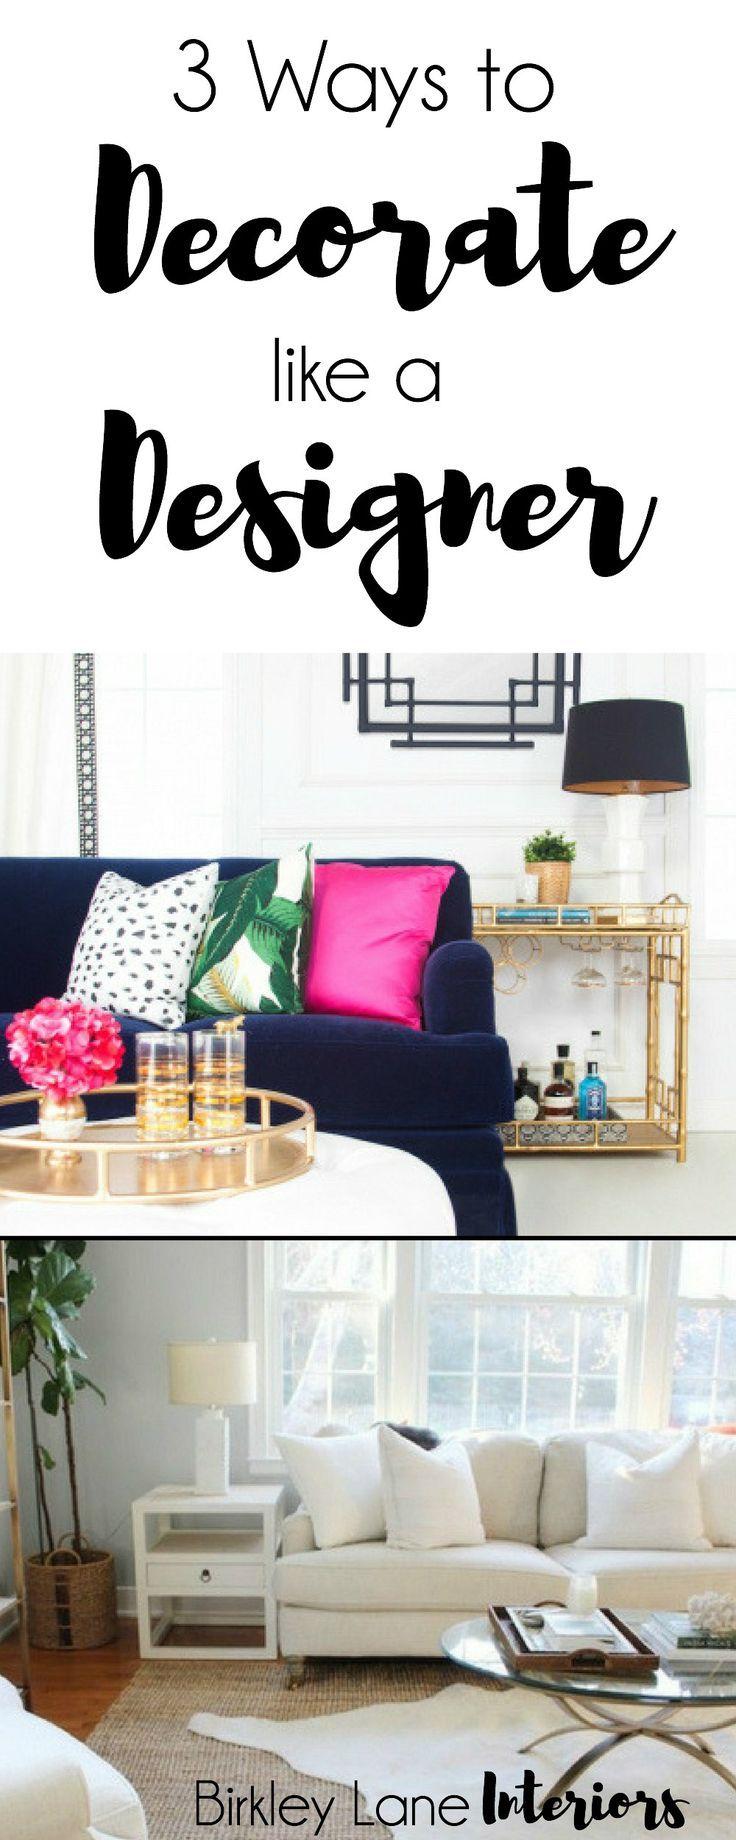 Decorating like joanna gaines - 3 Ways To Decorate Like A Designer